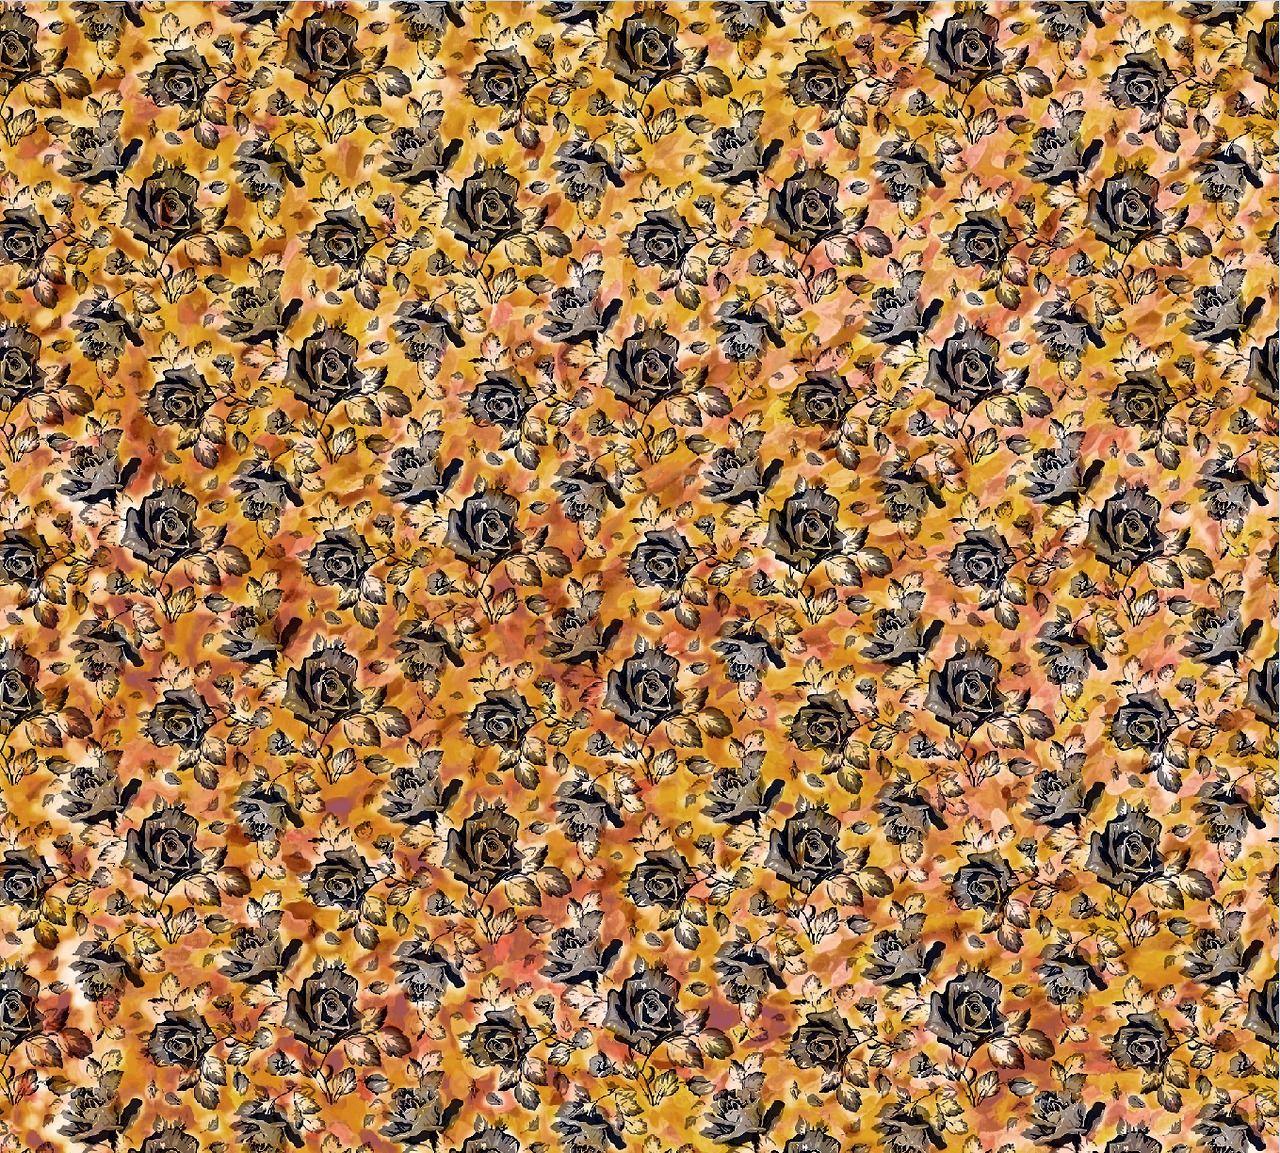 Lumi - Lunelli Textil | www.lunelli.com.br